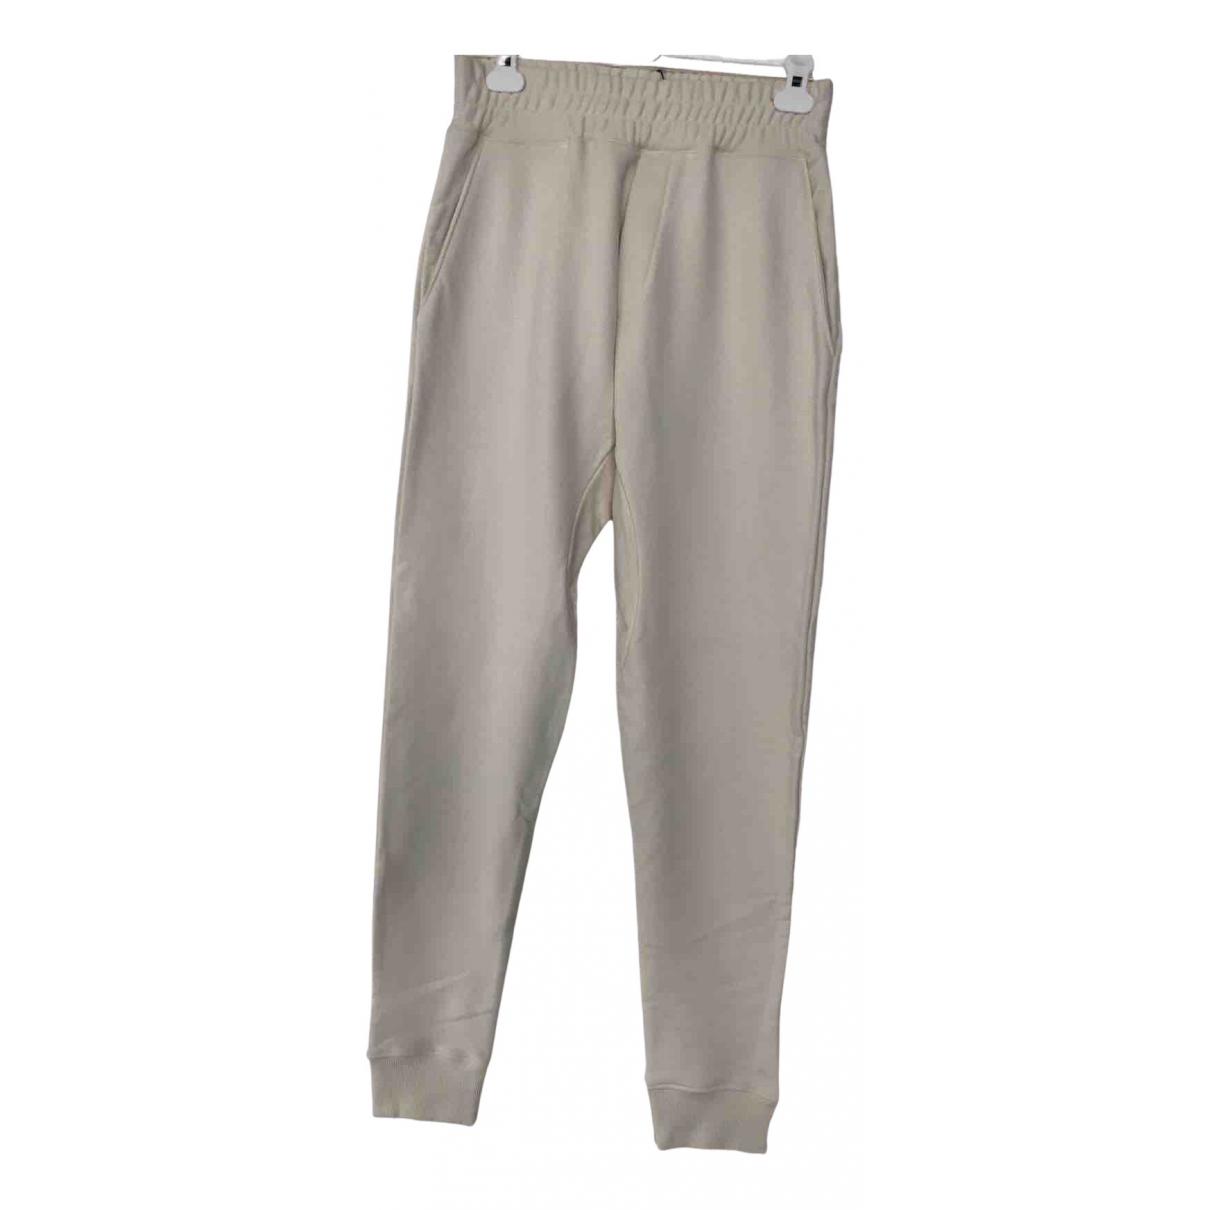 Pantalones en Algodon Beige Ih Nom Uh Nit